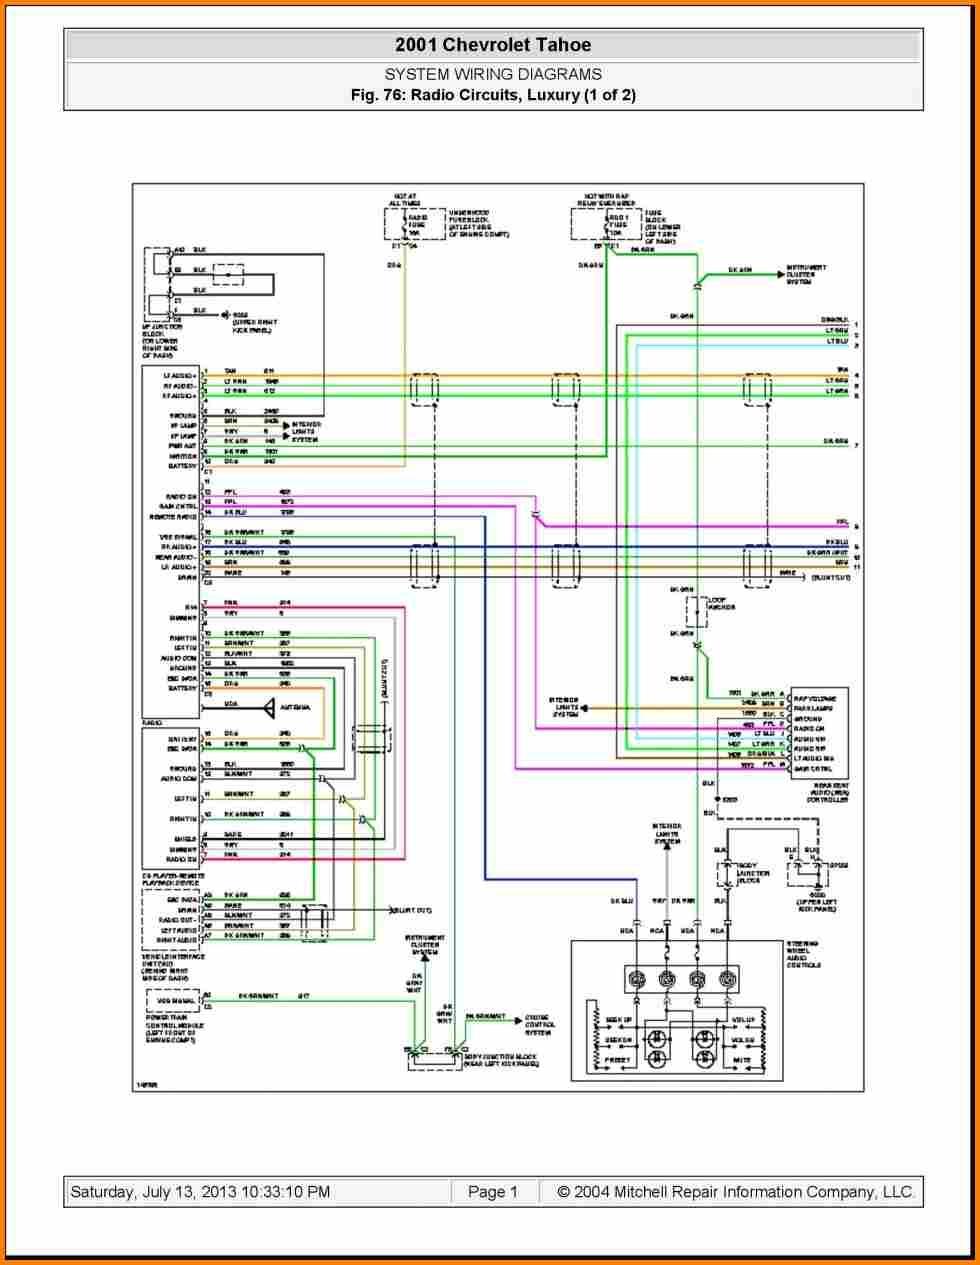 hight resolution of 2003 gmc yukon bose radio wiring diagram 2003 chevy silverado wiring diagram 2004 chevrolet radio